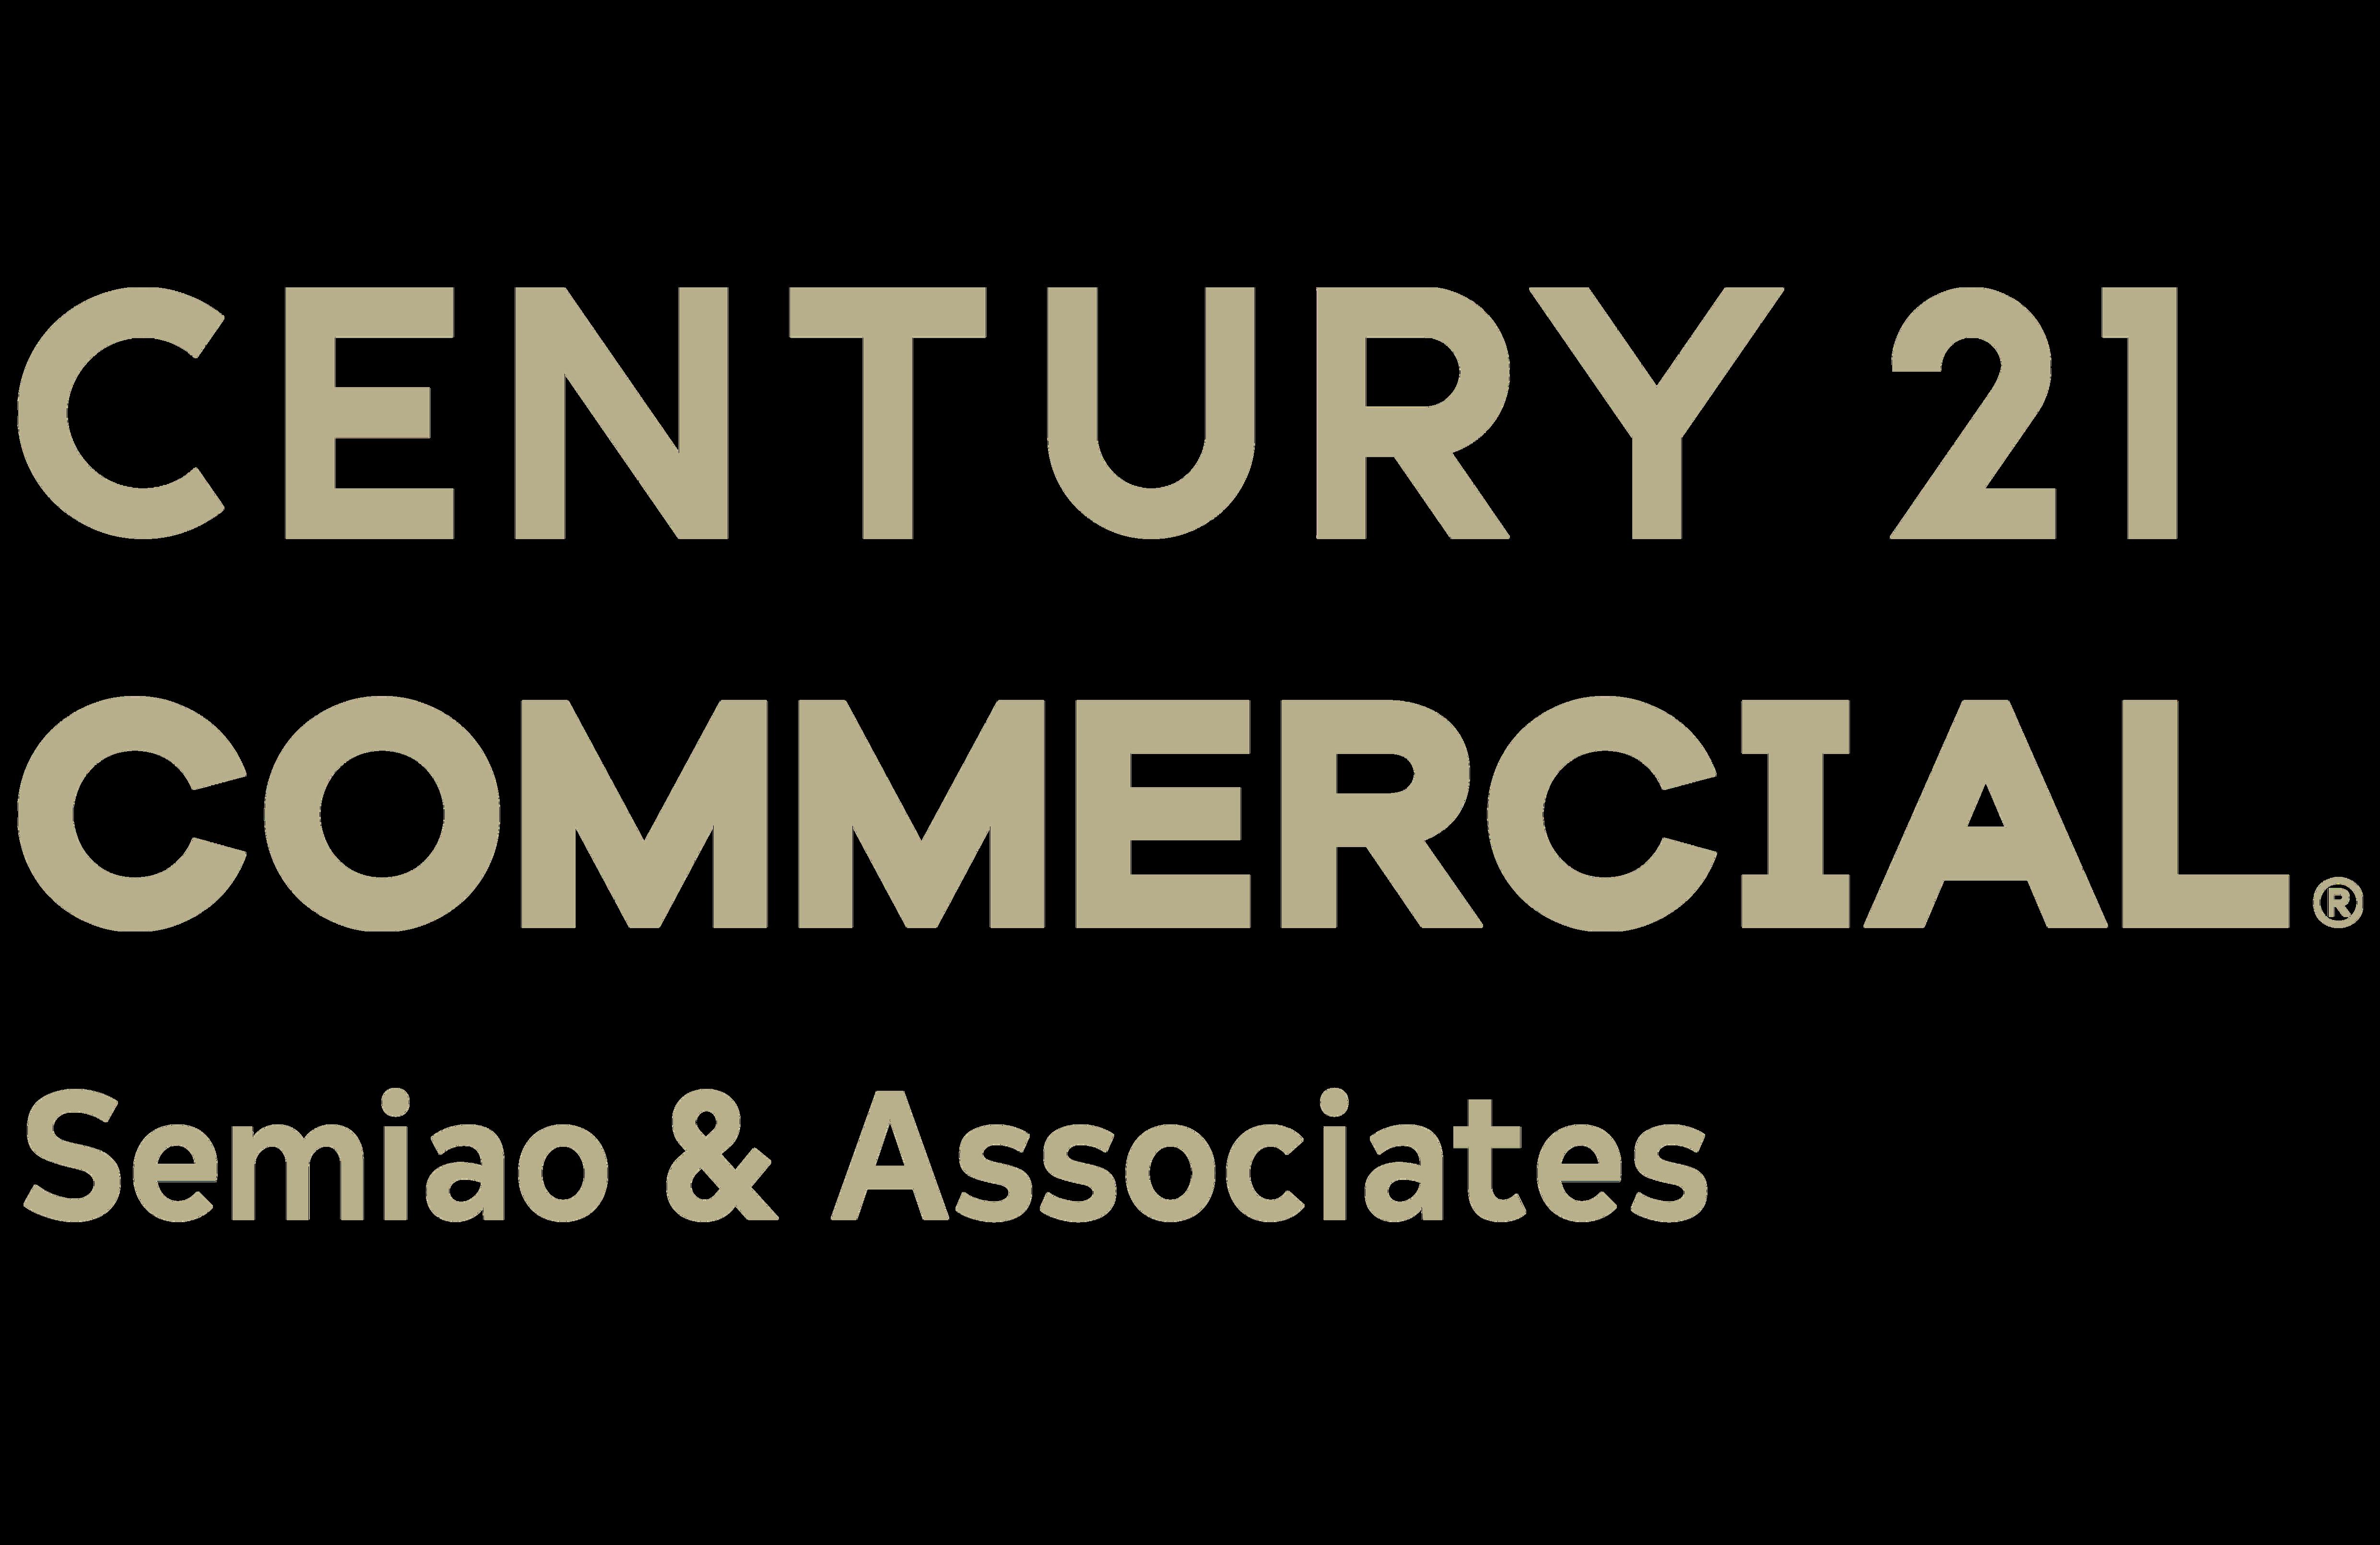 CENTURY 21 Semiao & Associates